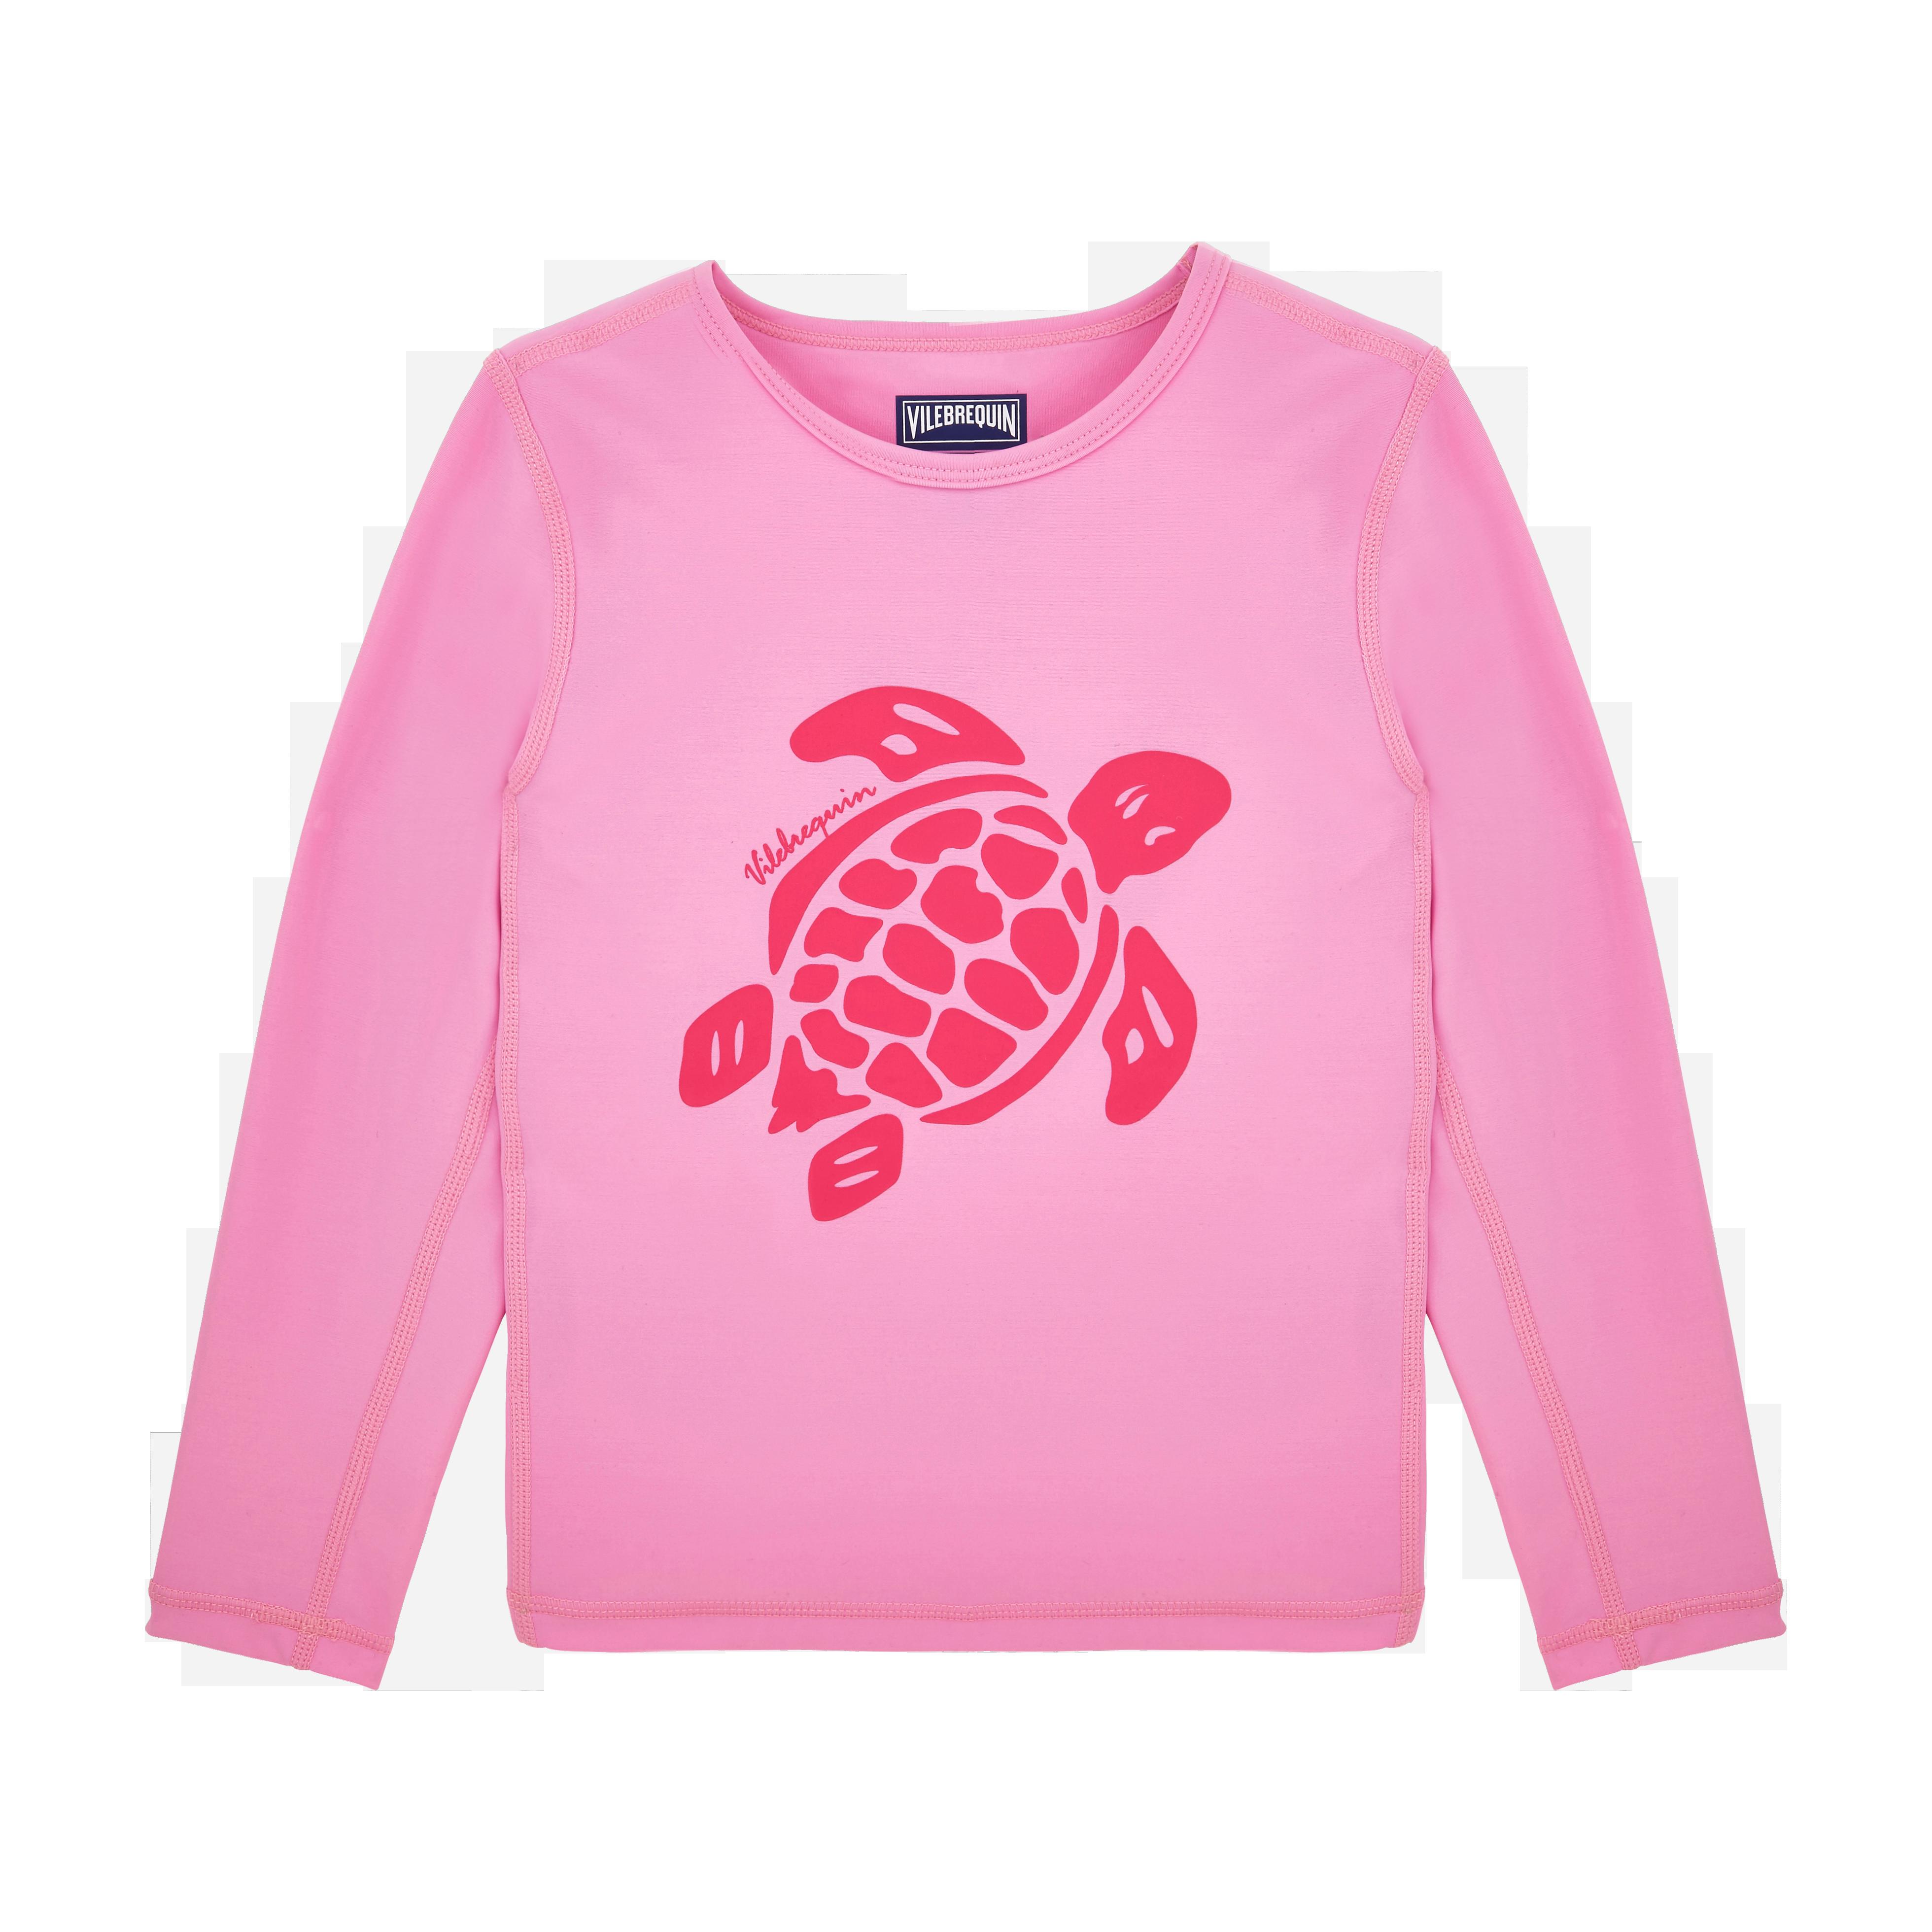 VILEBREQUIN | PAP UNISEXE ENFANT - Kids Long Sleeves Rashguards Solid - TEE SHIRT - GATUV - Pink - 14 - Vilebrequin | Goxip